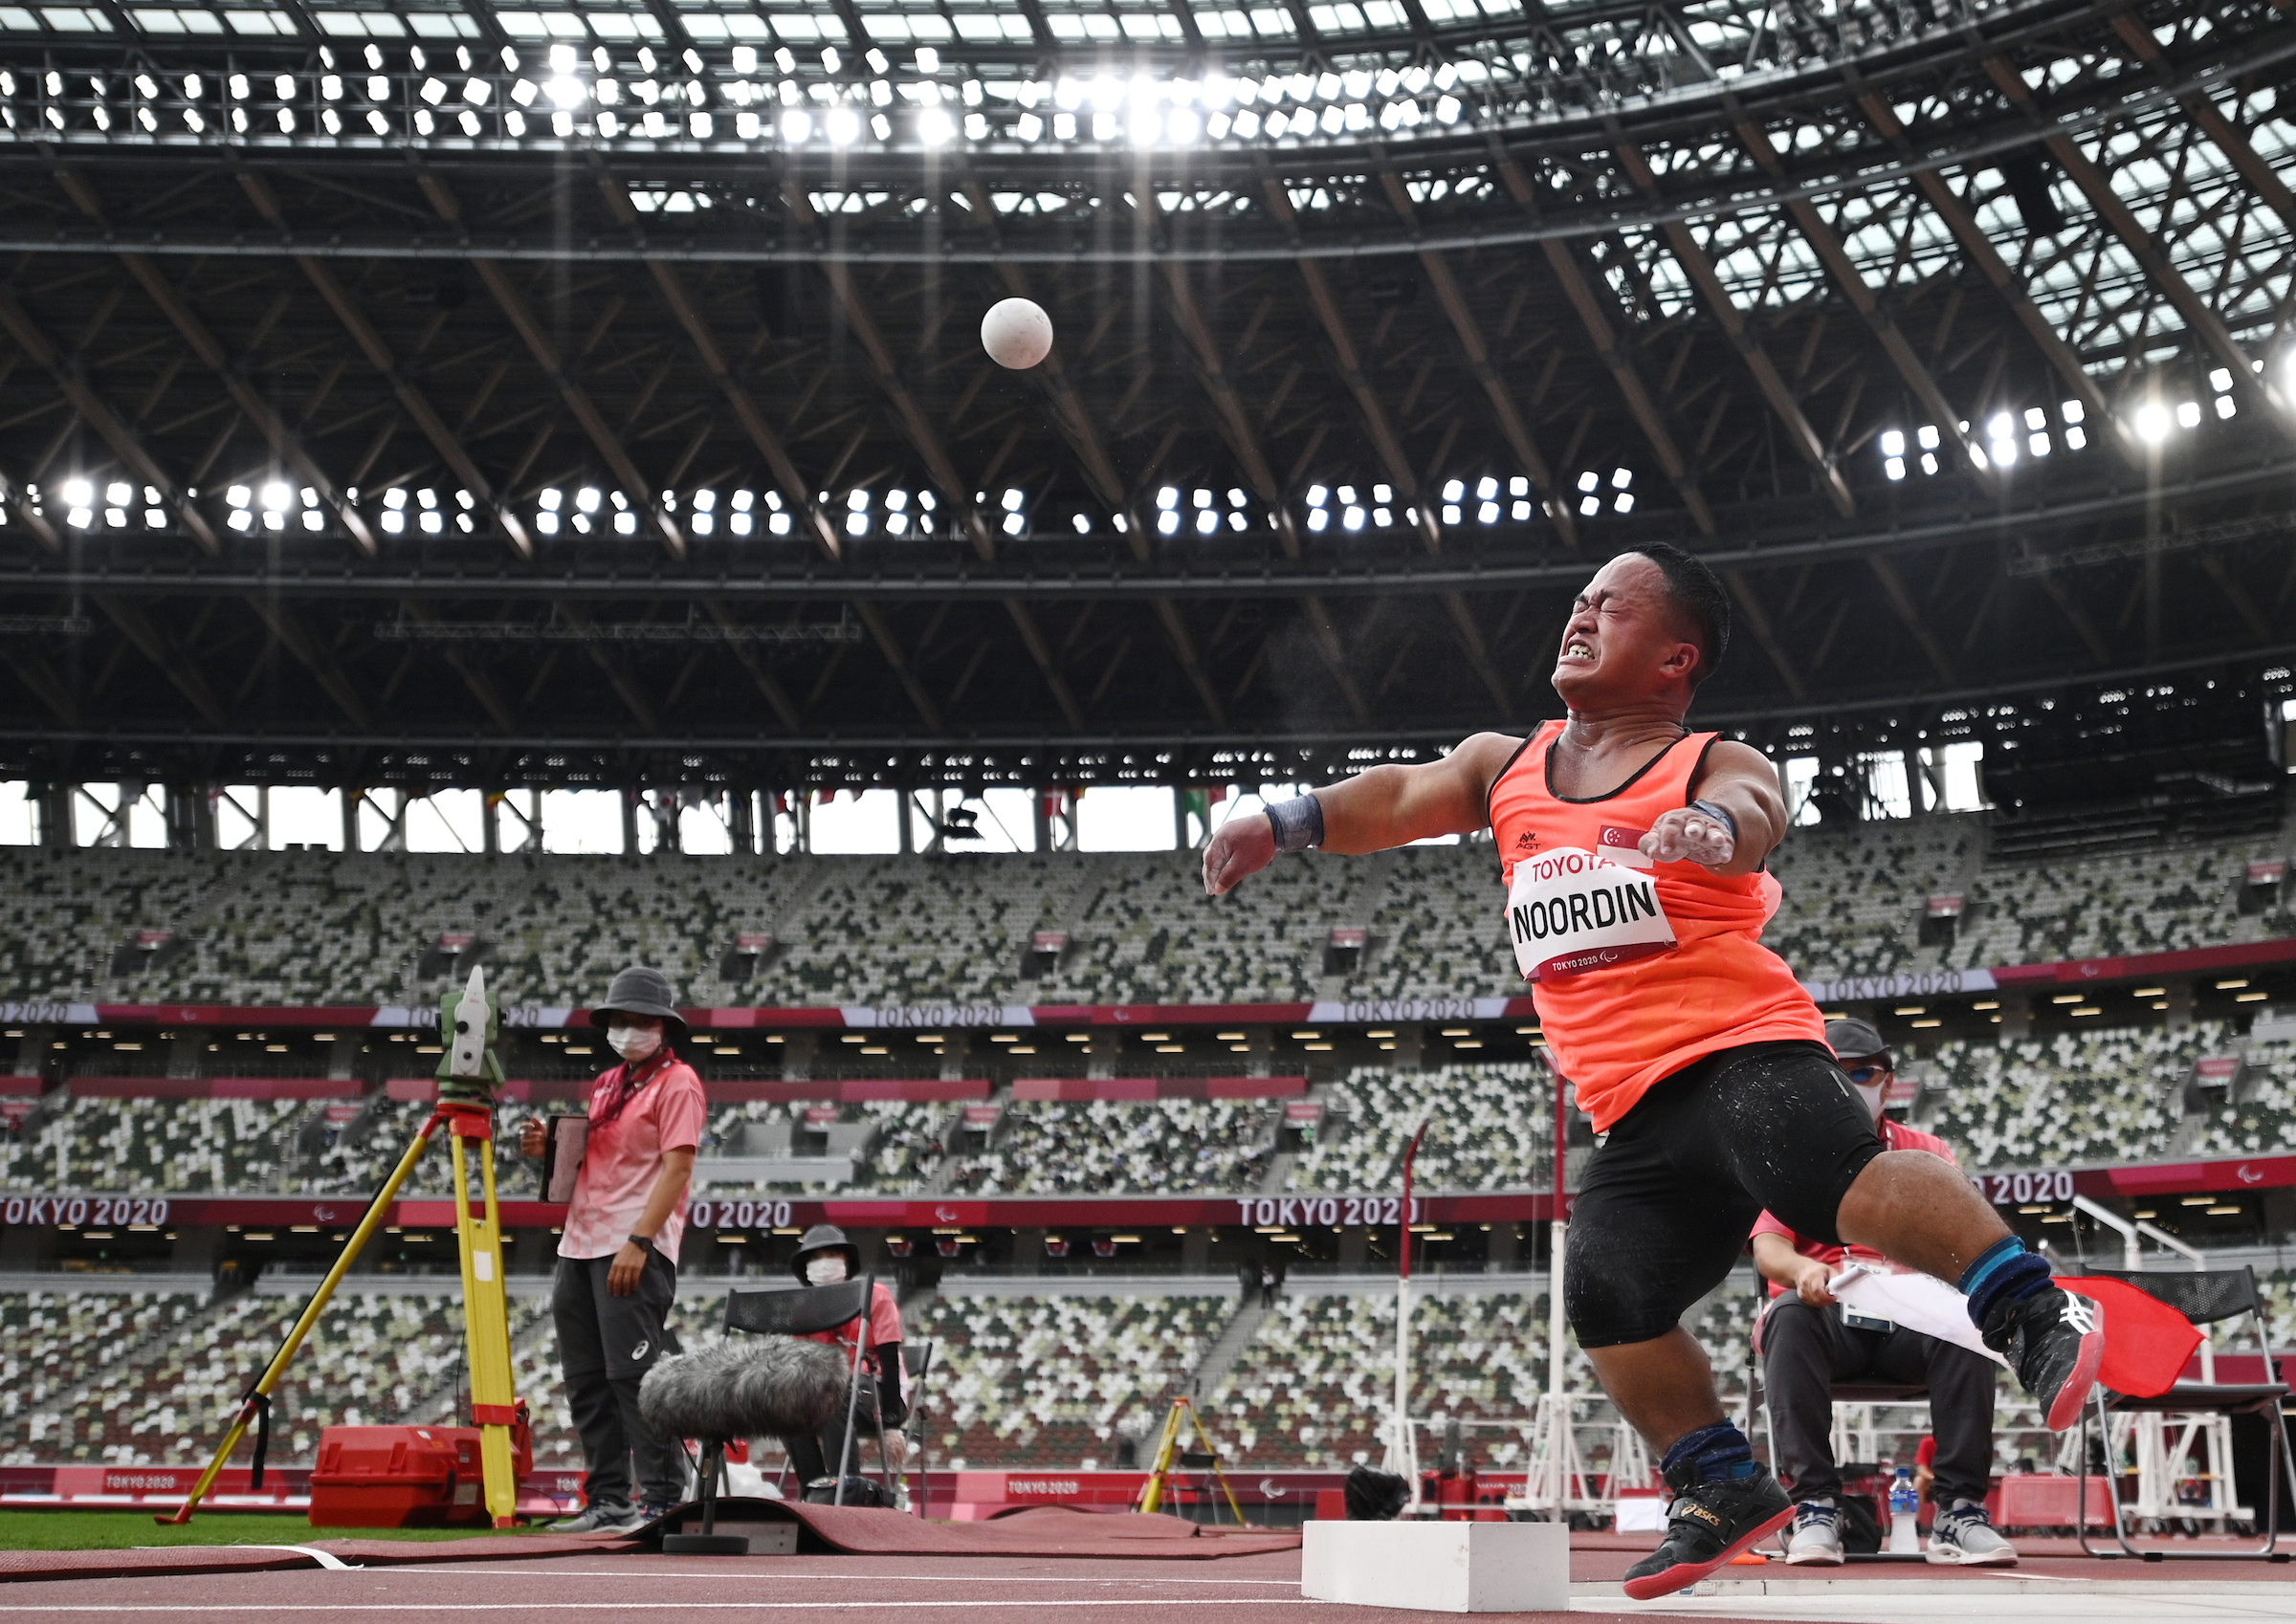 Tokyo 2020: TeamSG's Md Diroy Bin Noordin sets new National Record, in splendid Men's Shot Put F40 showing!